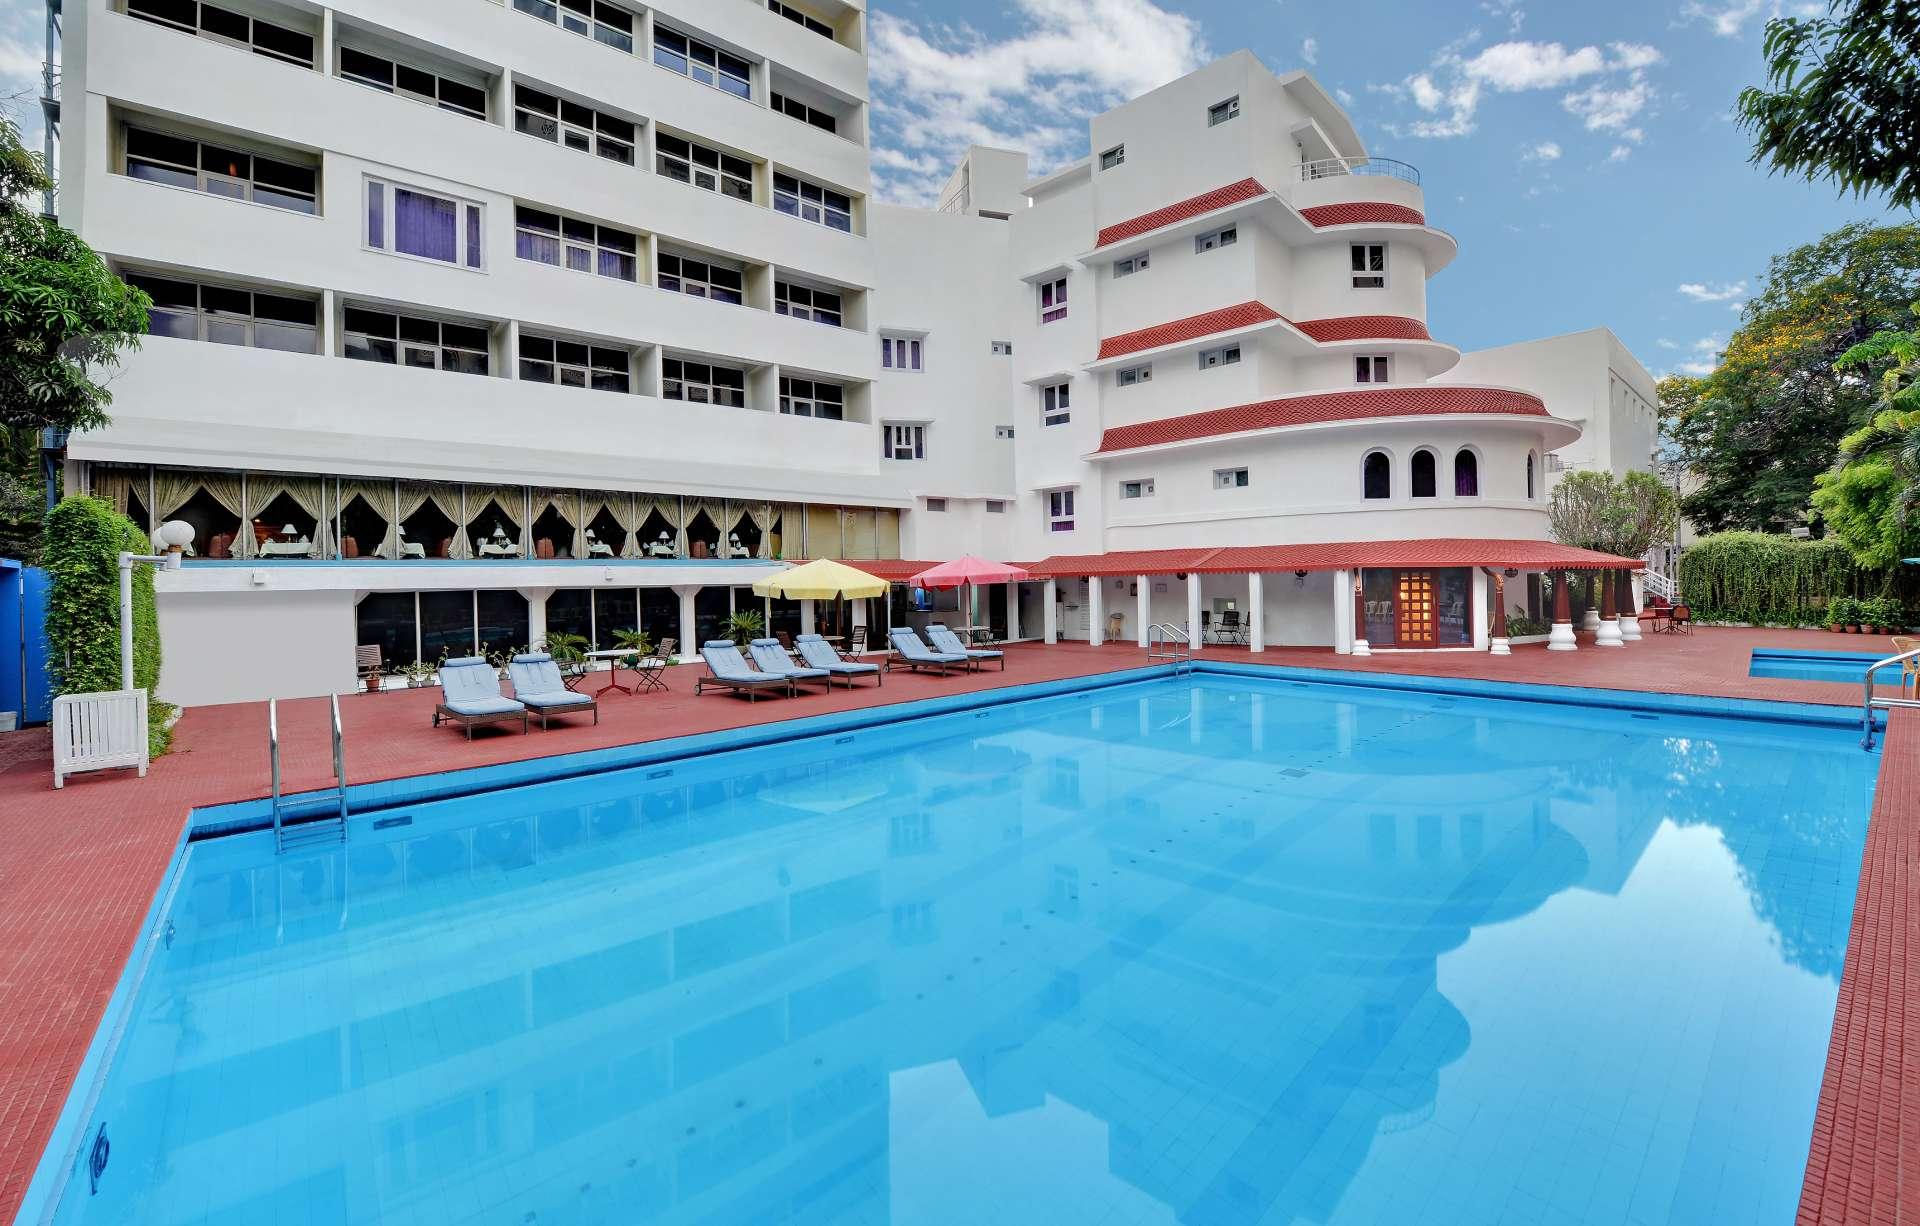 swimming pool ambassador pallava chennai - The Ambassador | Heritage Hotels in Mumbai, Aurangabad, Chennai - Ambassador Pallava Chennai